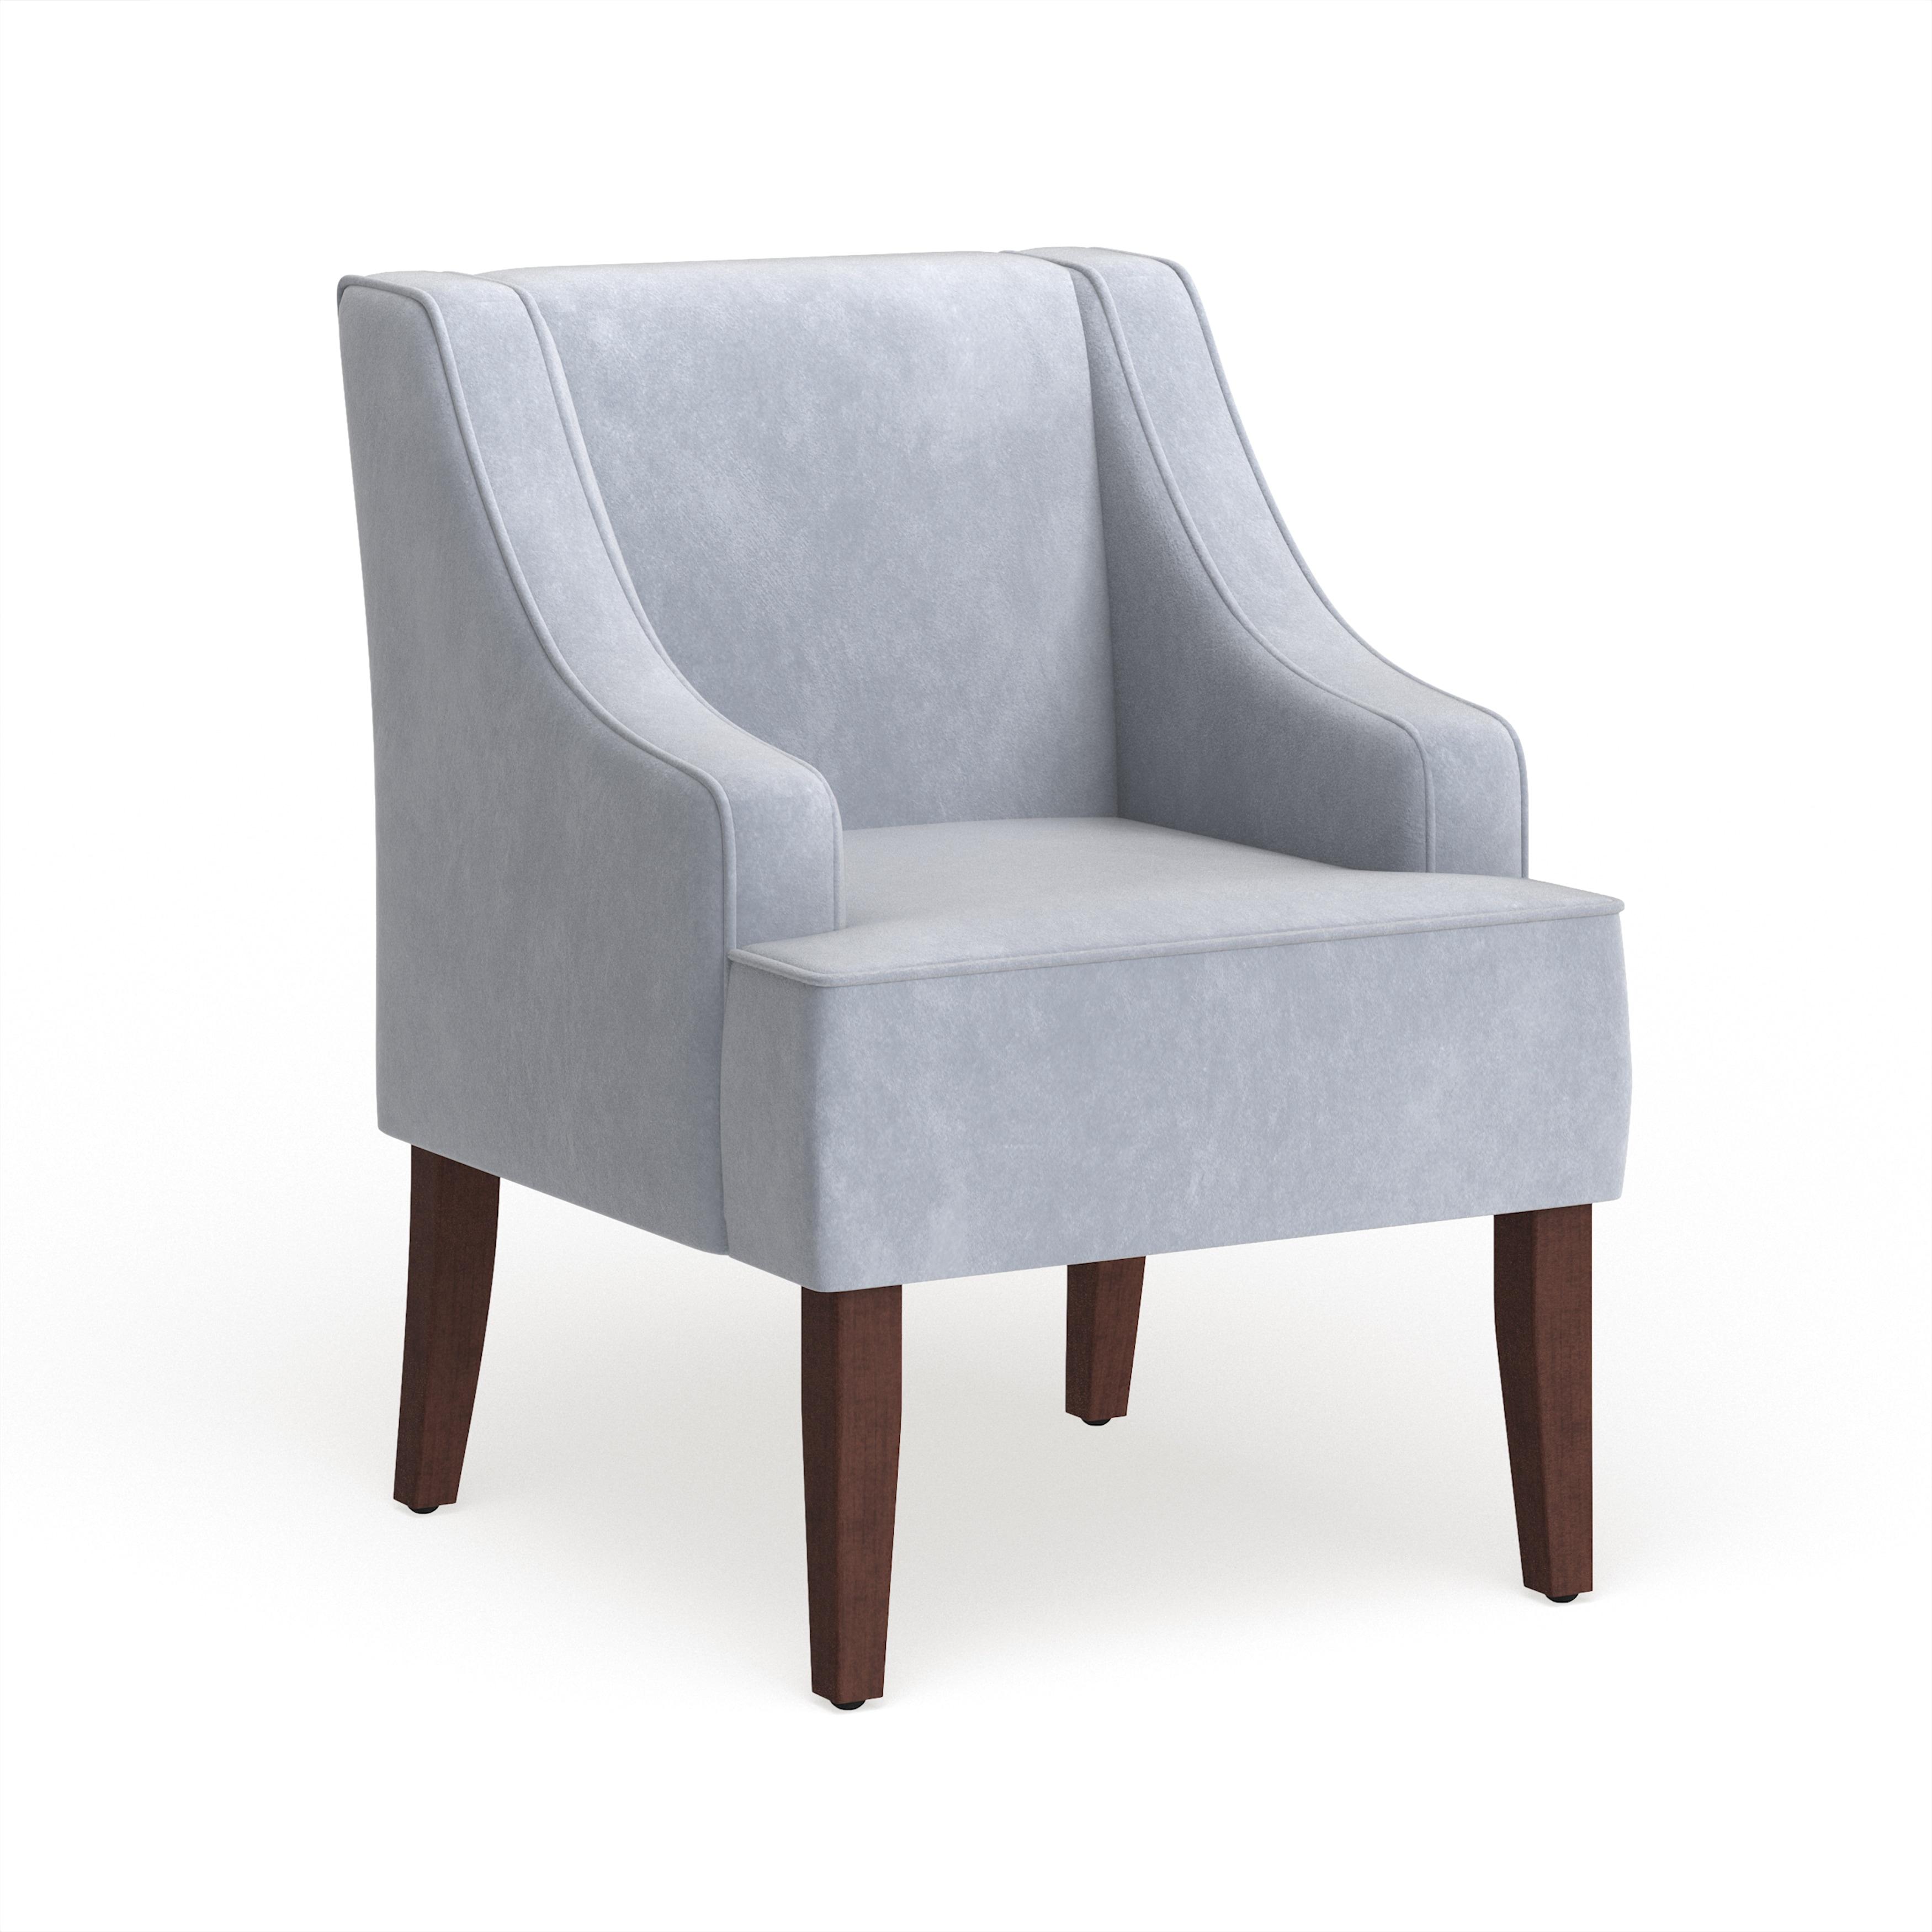 Porch & Den Lyric Dove Velvet Swoop Arm Accent Chair